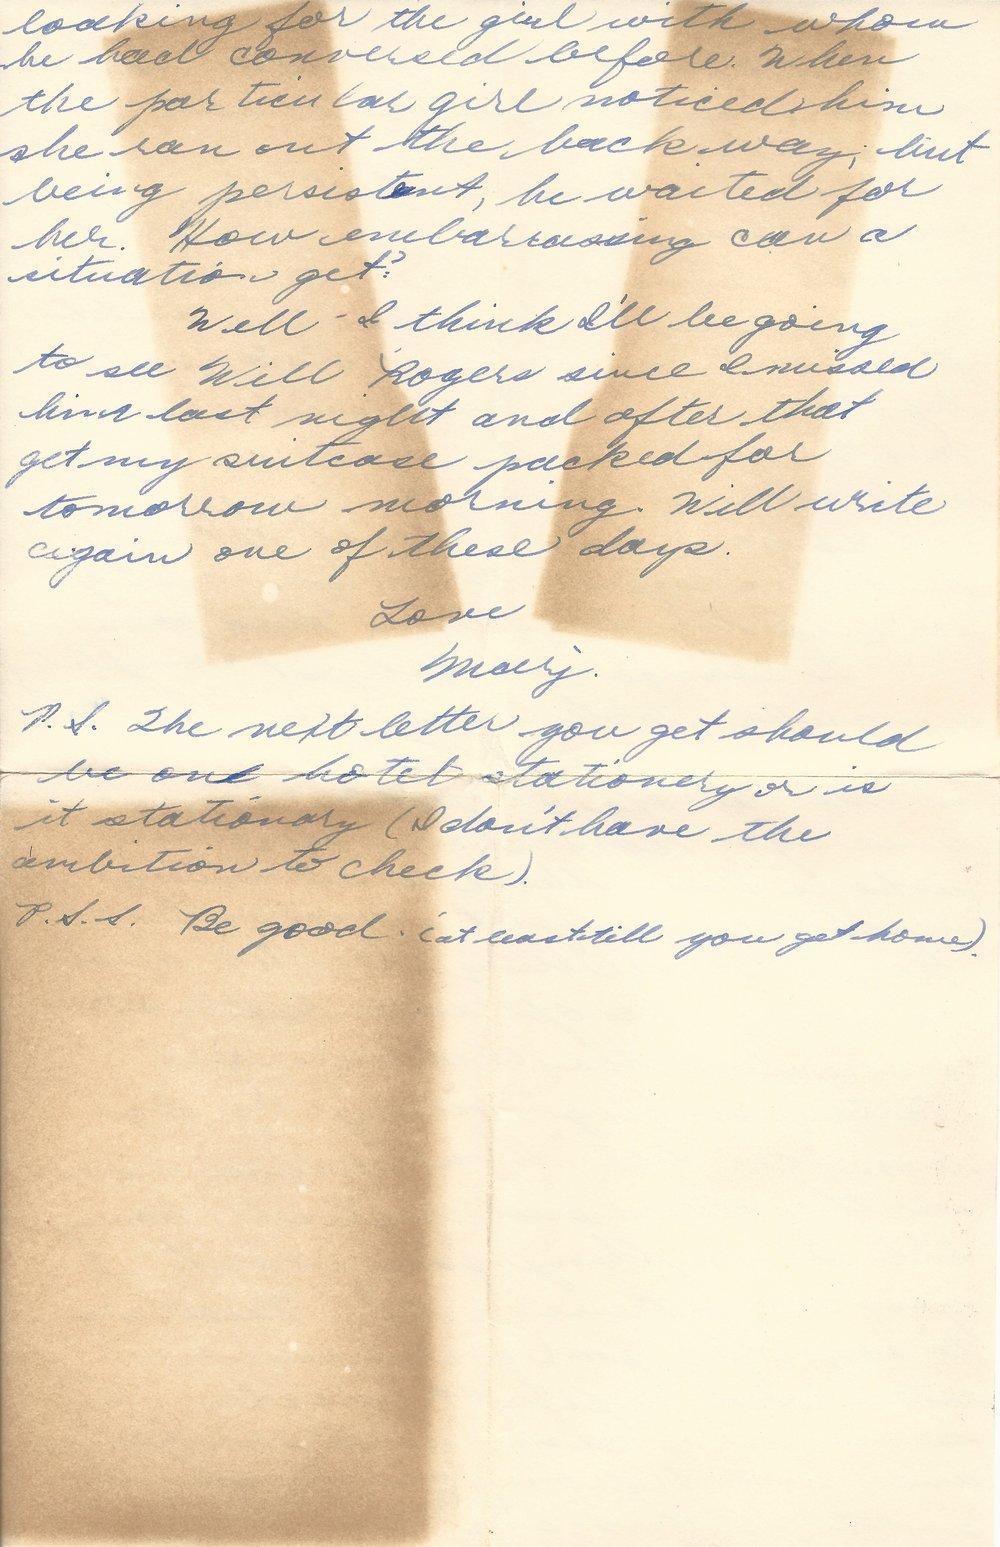 5. Nov. 8, 1952 (Oma)_Page_5.jpg